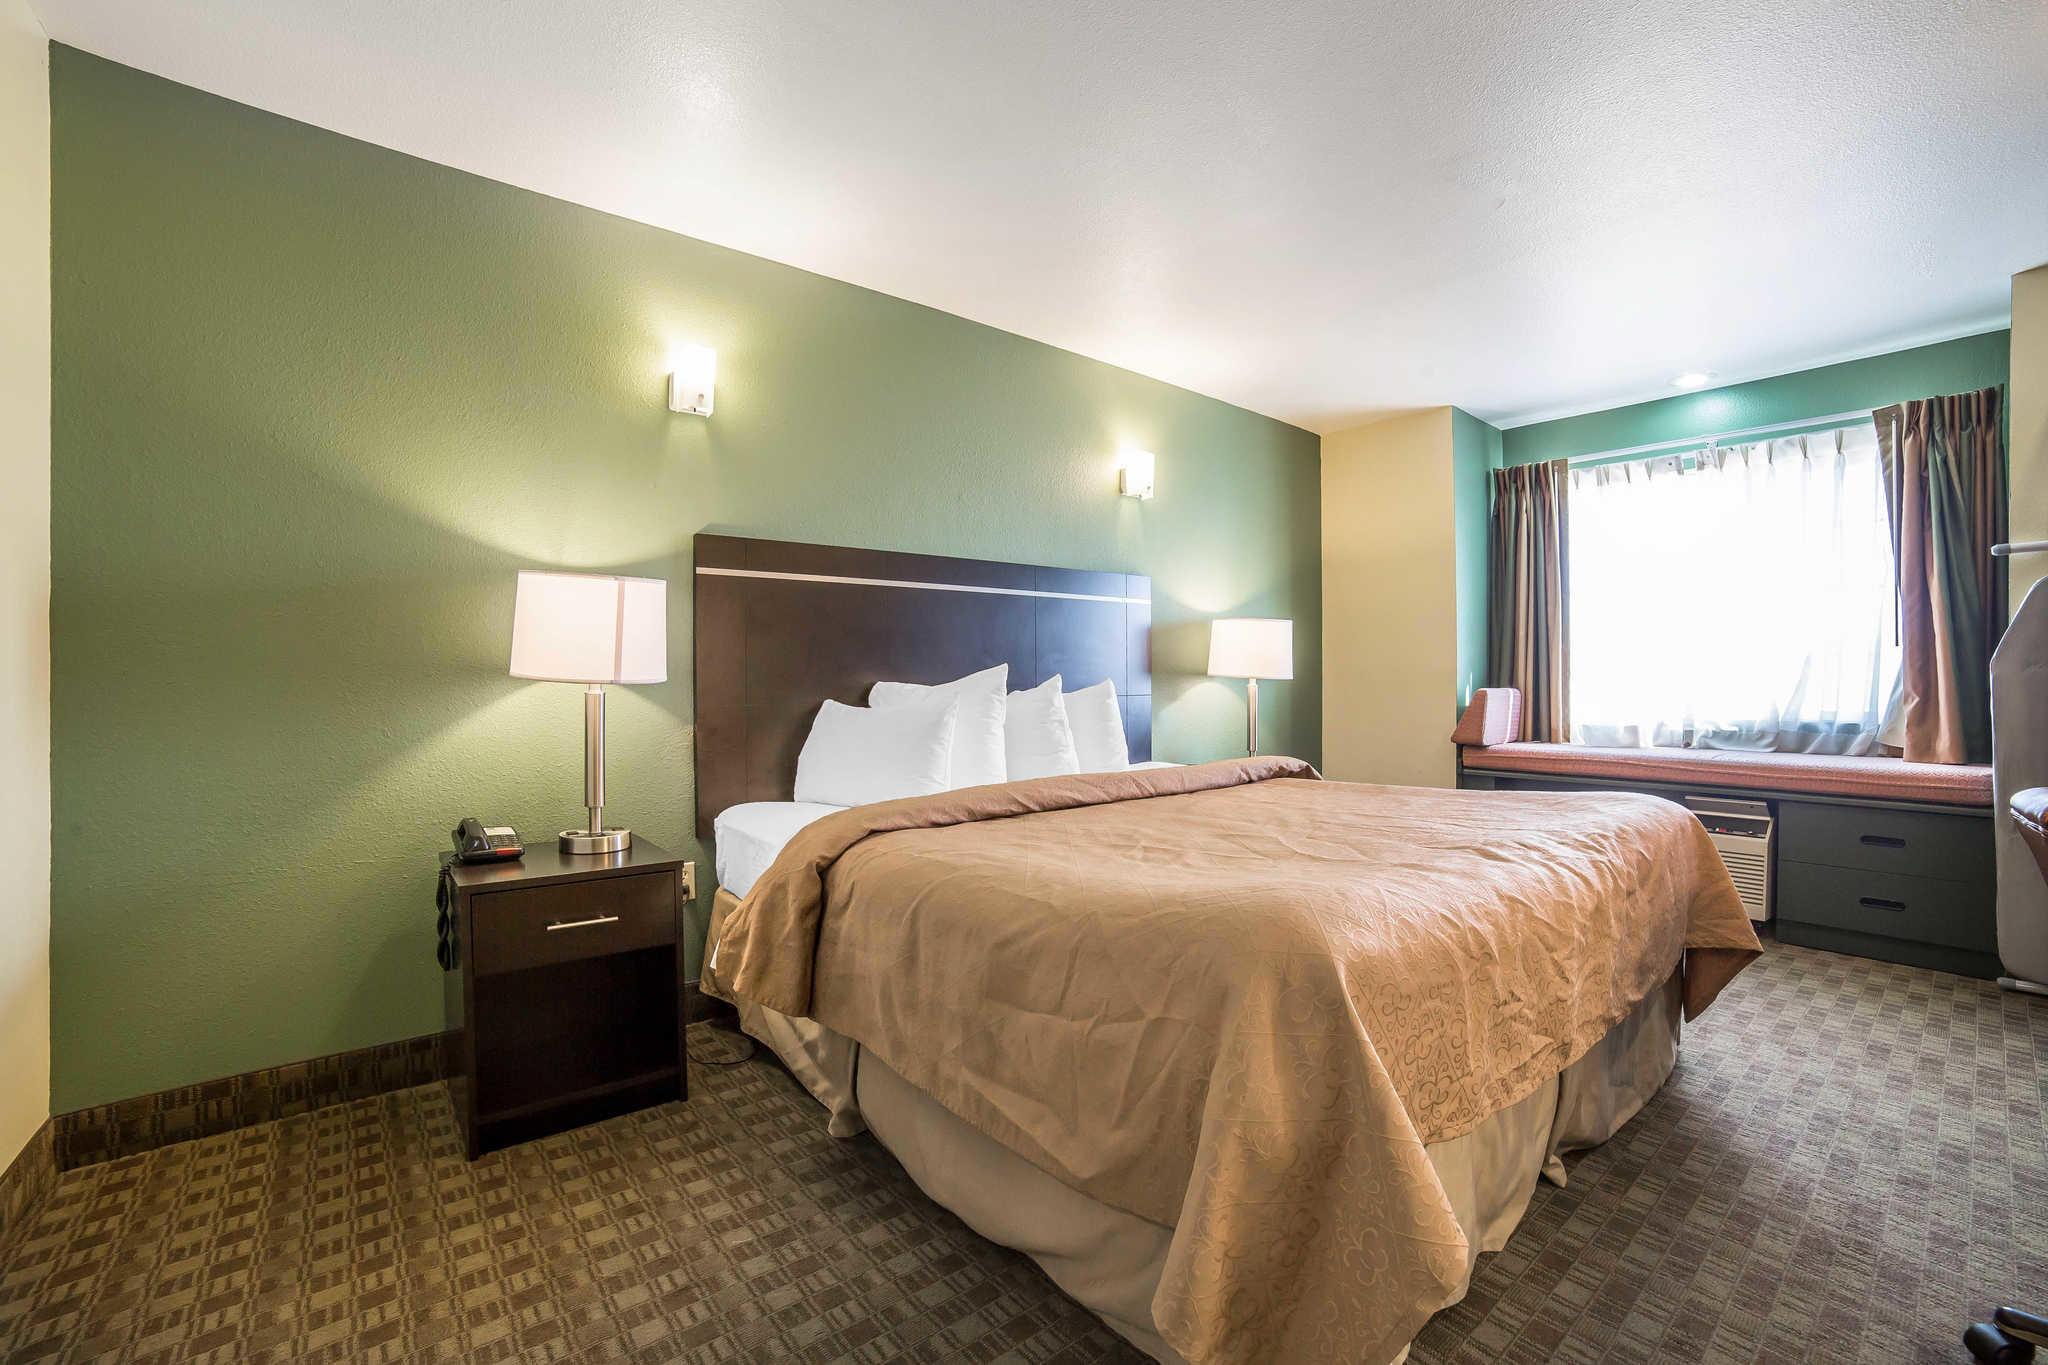 Quality Inn & Suites Elko image 7